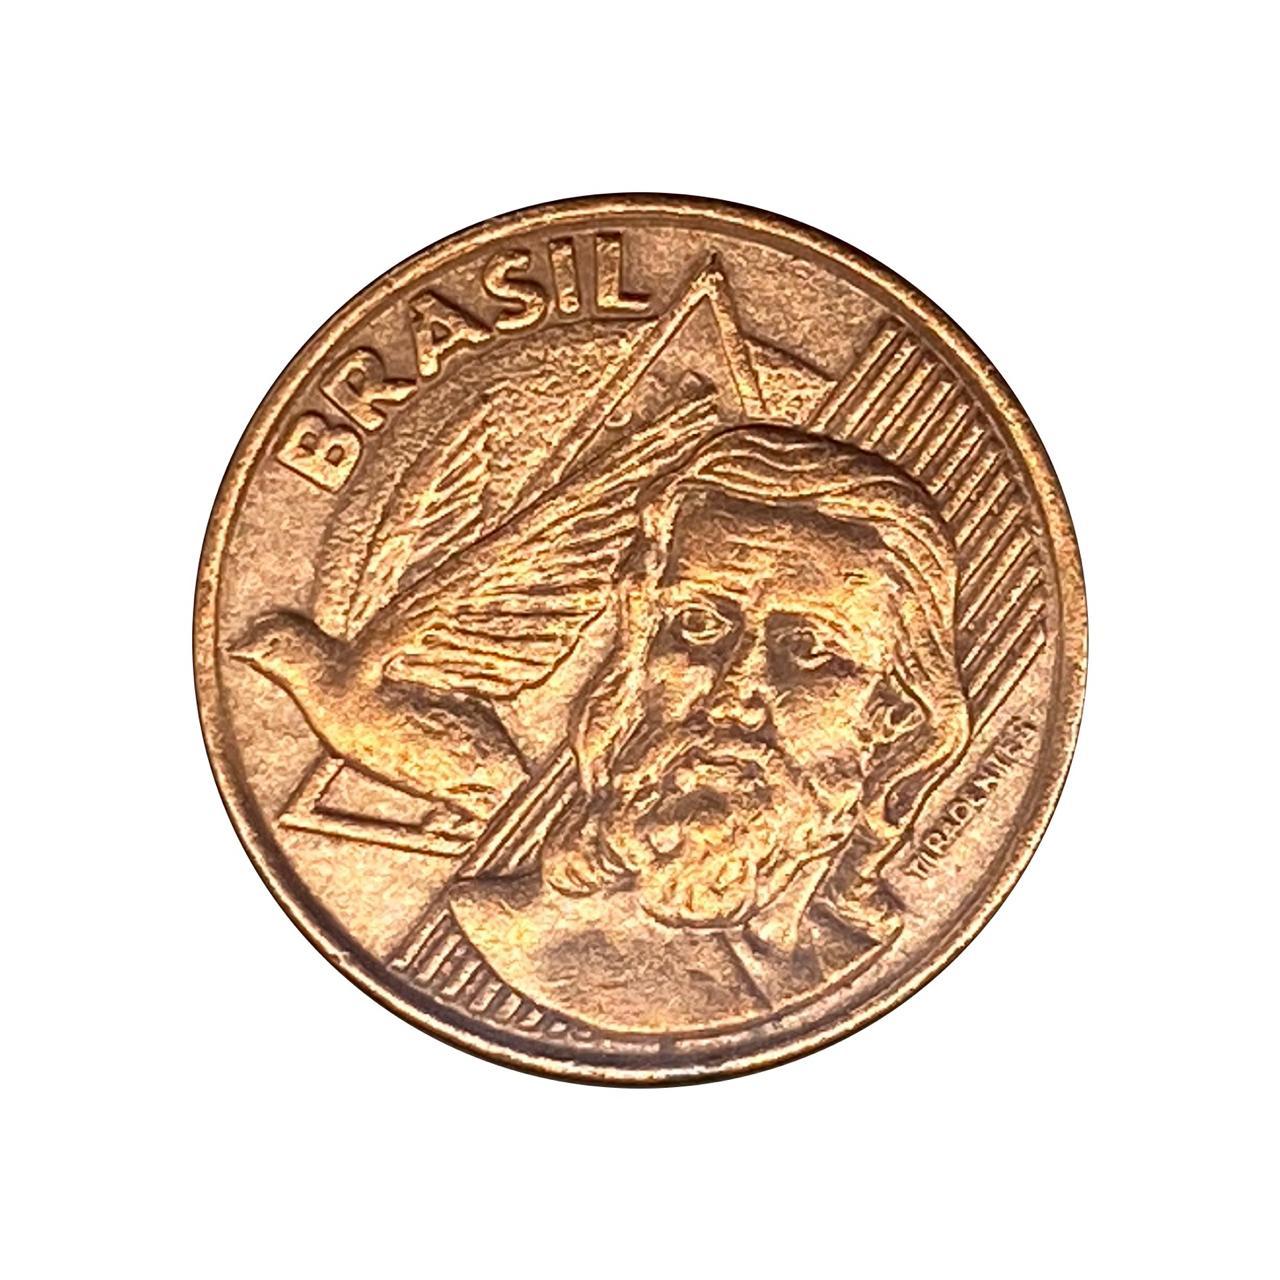 Moeda Brasil 5 centavos 2000 Escassa MBC